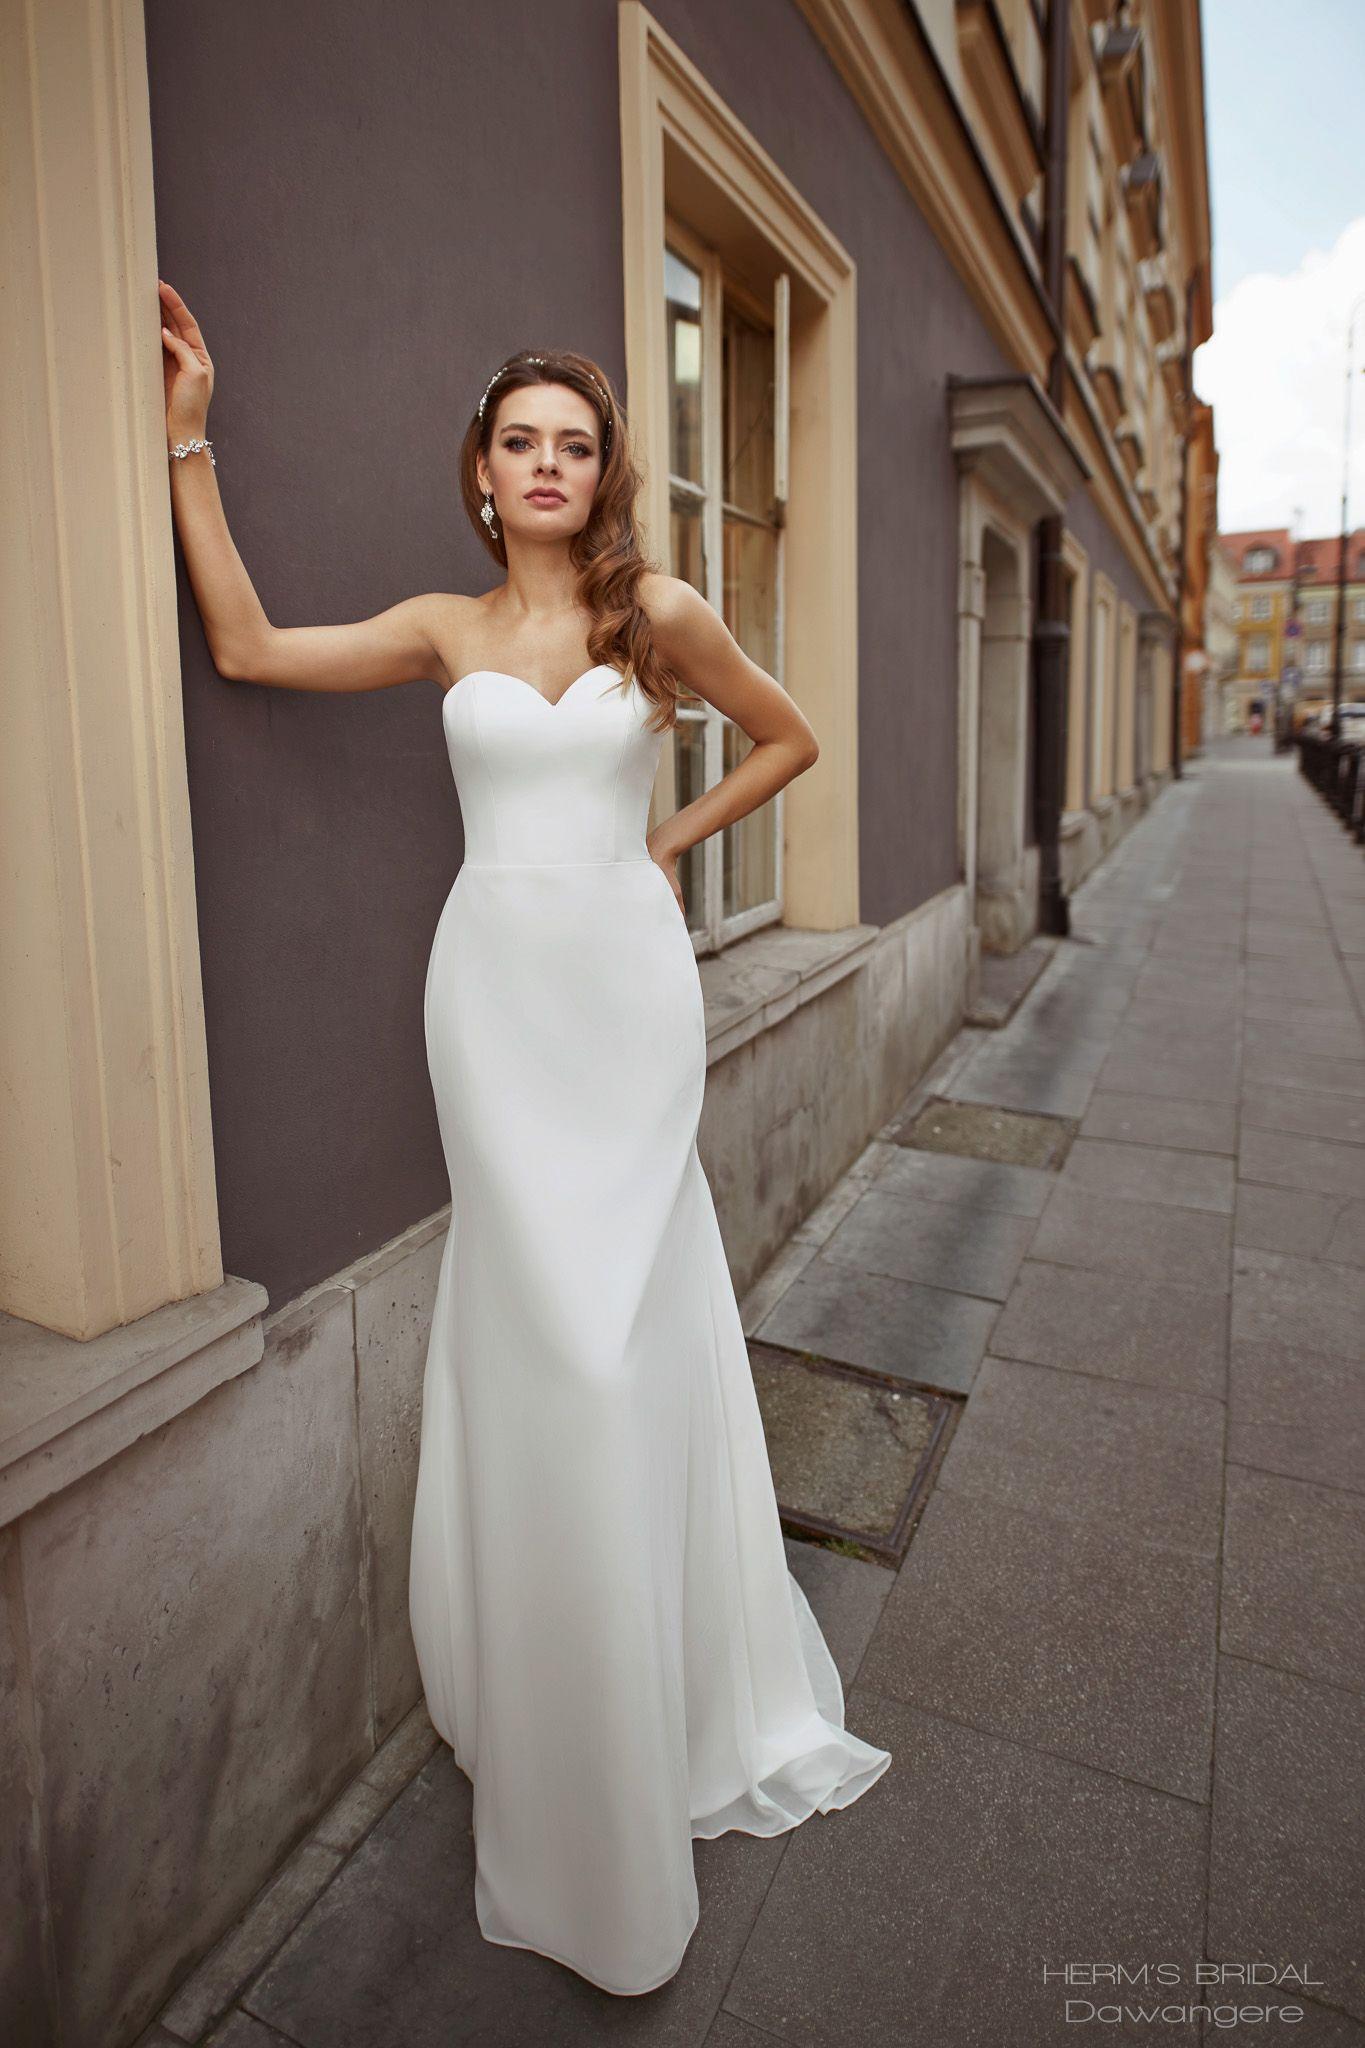 suknia slubna herms bridal Dawangere 1